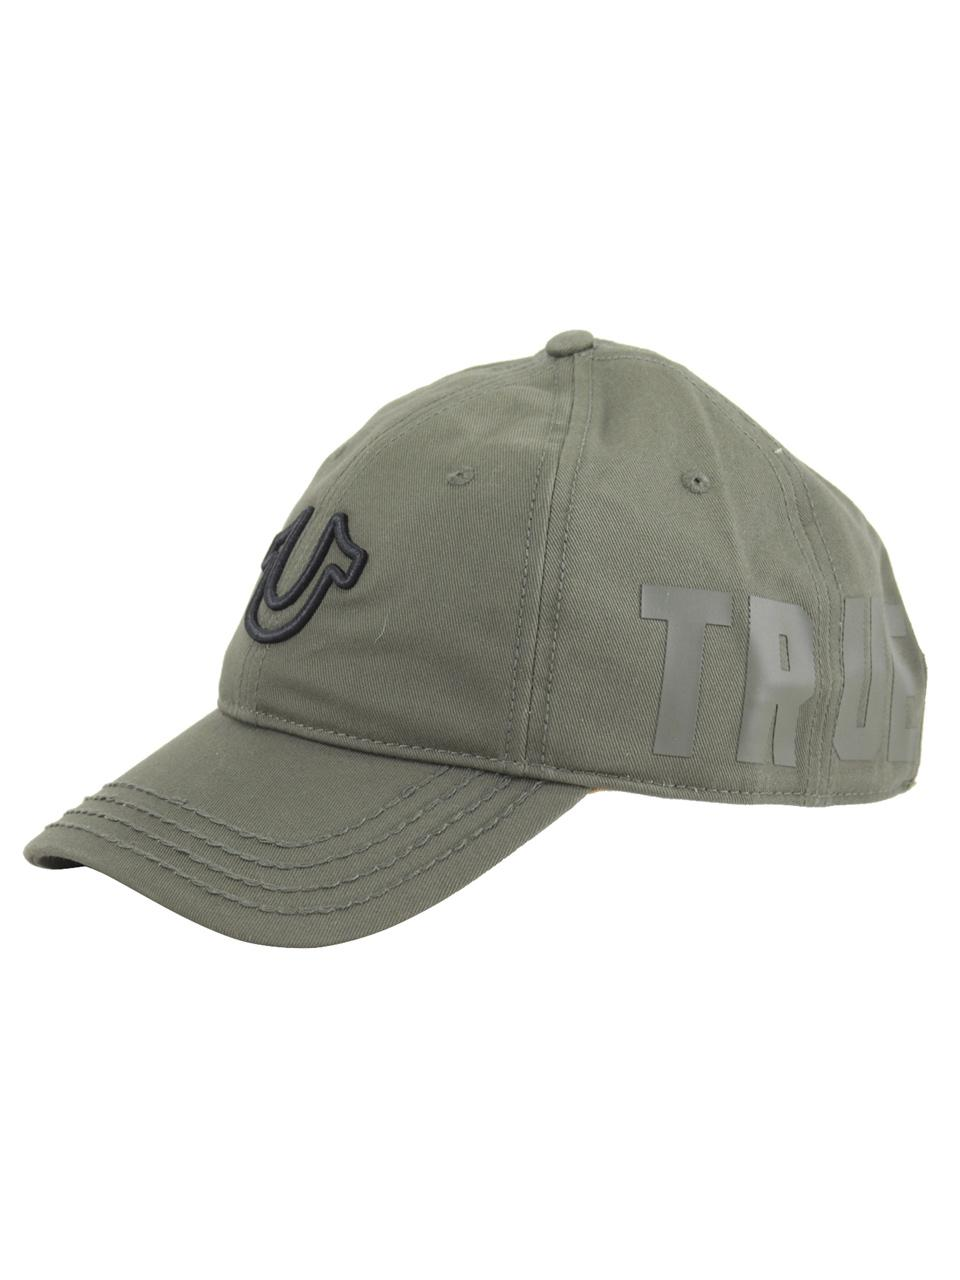 057b7af45bb2ea True Religion Men's 3D Horseshoe Cotton Strapback Baseball Cap Hat